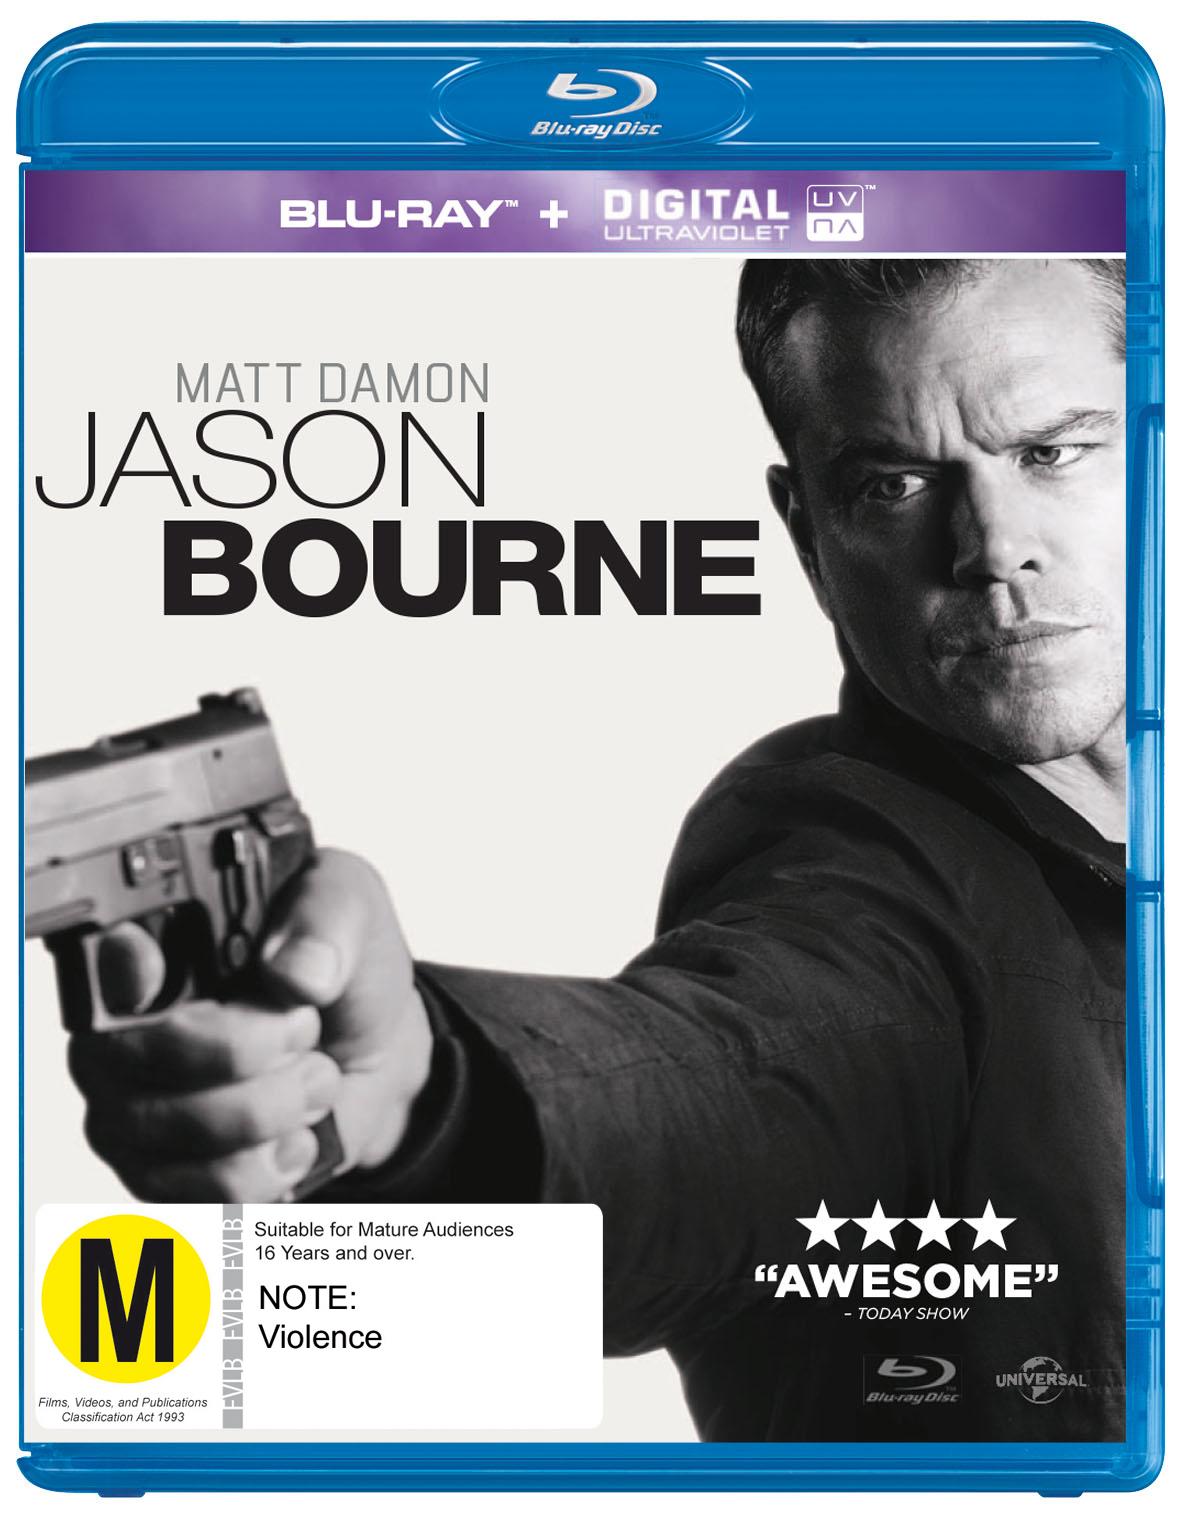 Jason Bourne on Blu-ray image